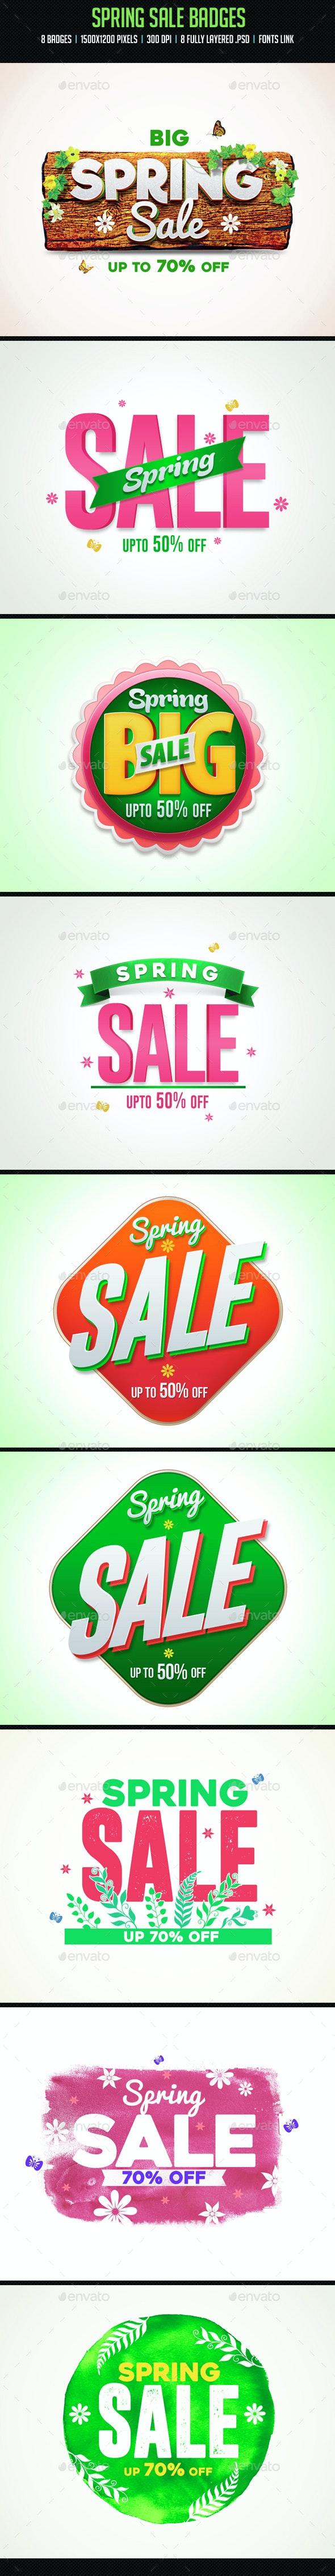 Spring Sale Badges - Badges & Stickers Web Elements